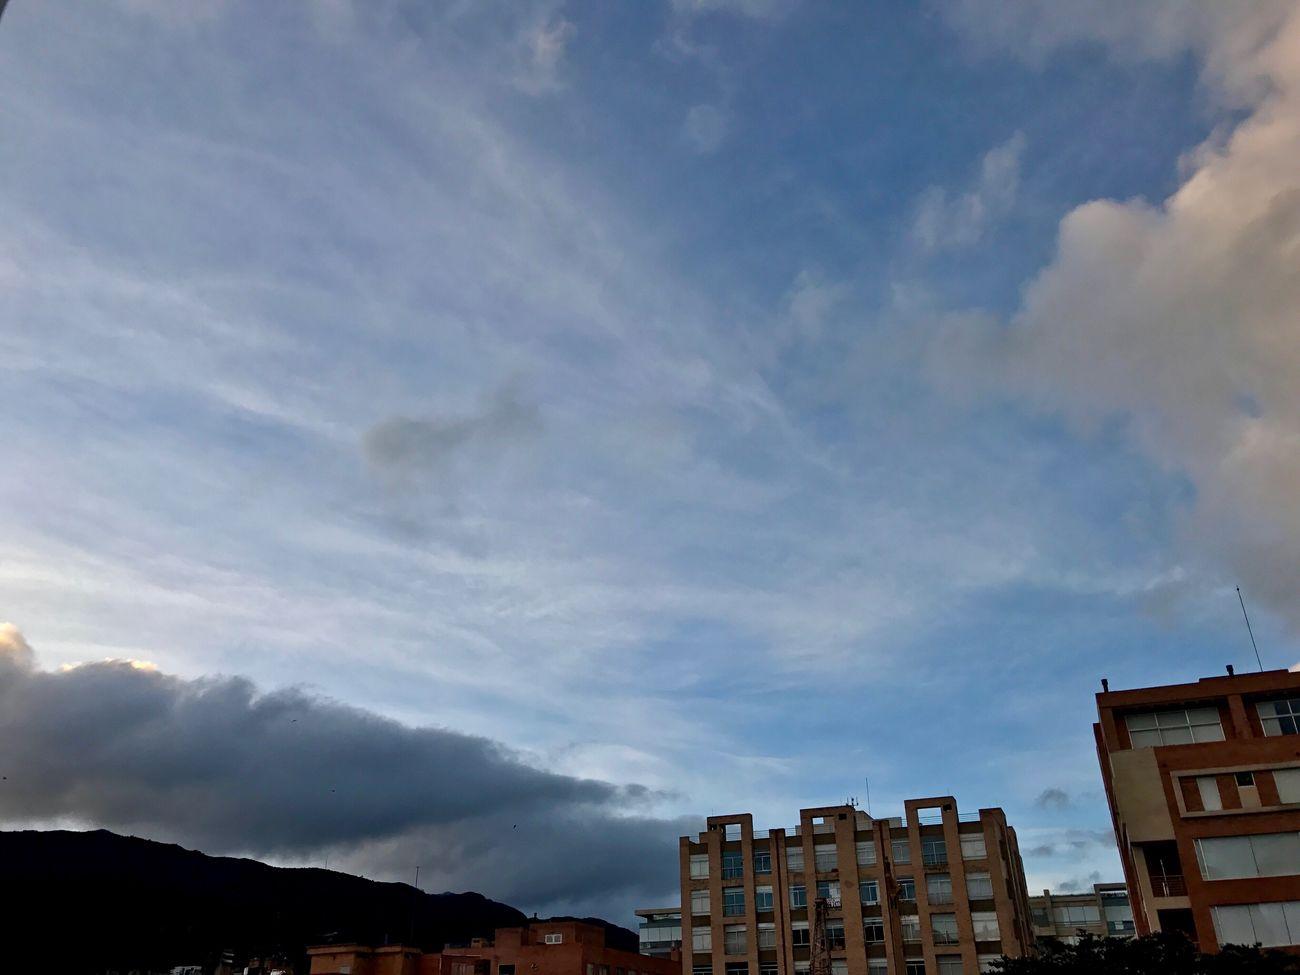 1 enero, 6:00 am, Bogotá NoEditNoFilter AmoserdeColombia EyeEm Best Shots EyeEmBestPics Contemplating Colombia ♥  ILoveBogota I❤️Bogotá No Edit/no Filter Cloud - Sky Sky City SoyBogotana Iphone7 Lovelysky